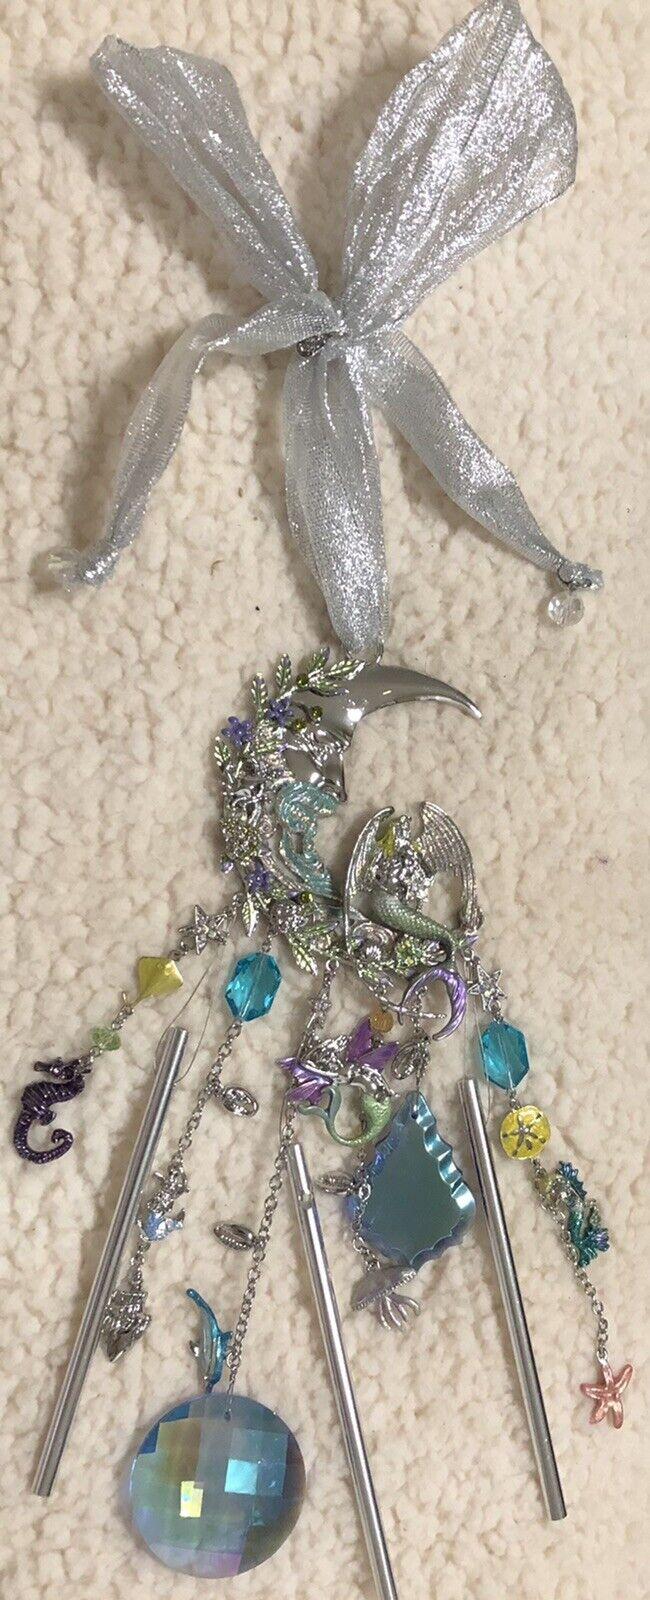 NIB Kirks Folly Mermaid Moon Crystal Wind Chime Enameled, Charms & Beads